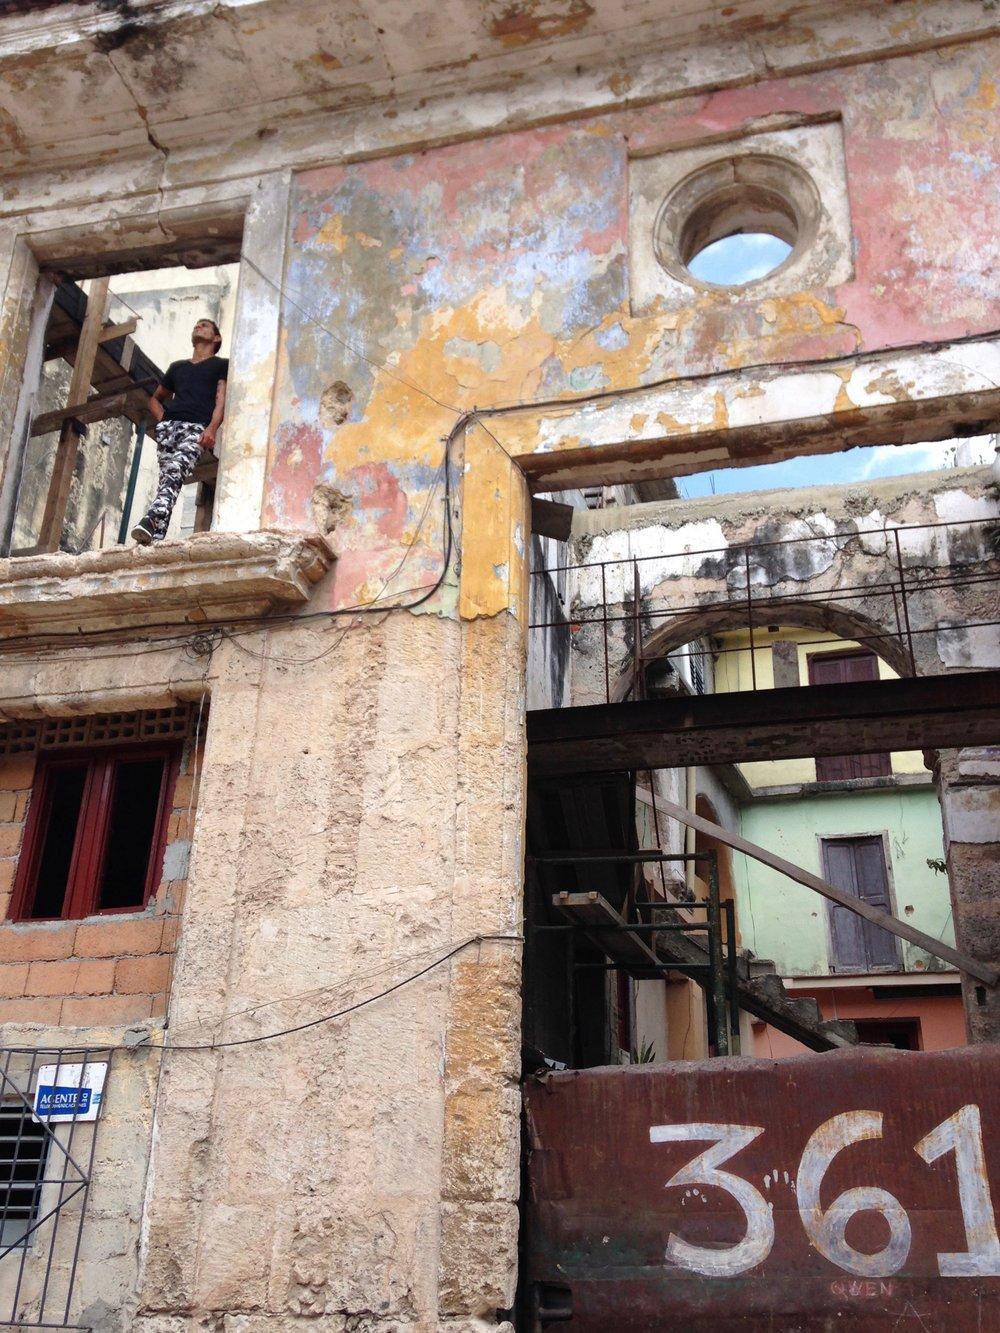 Habana Vieja. Photo by J. Austria